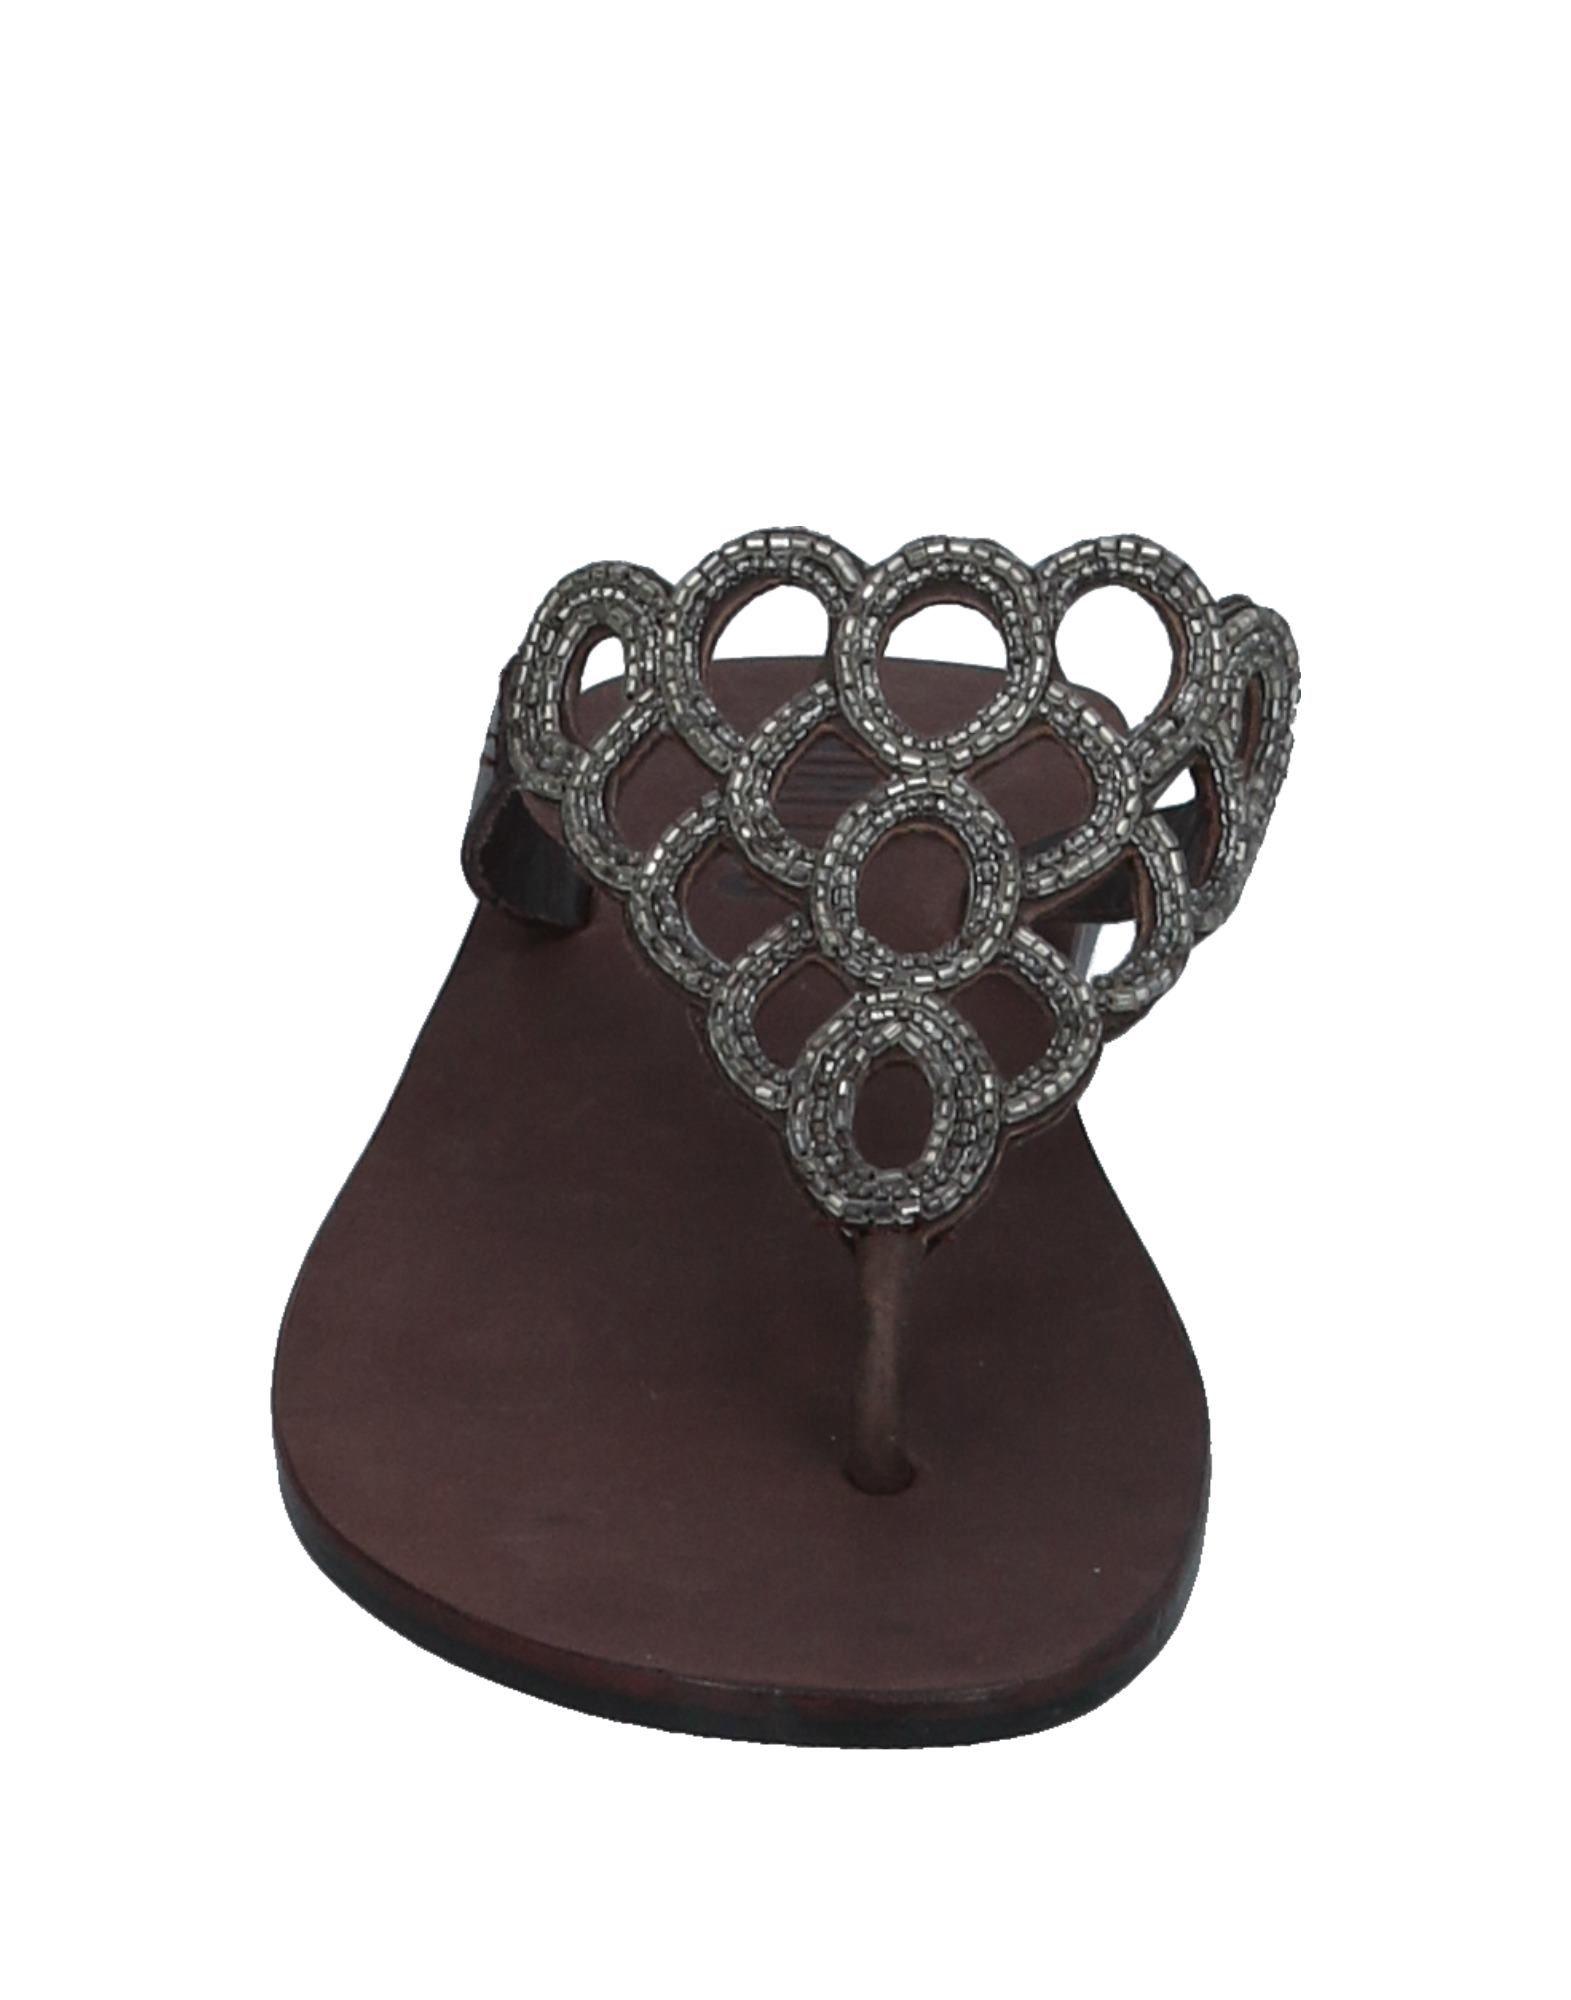 Bibi Lou Dianetten Damen  11522424VI Gute Qualität beliebte beliebte beliebte Schuhe 7132fe